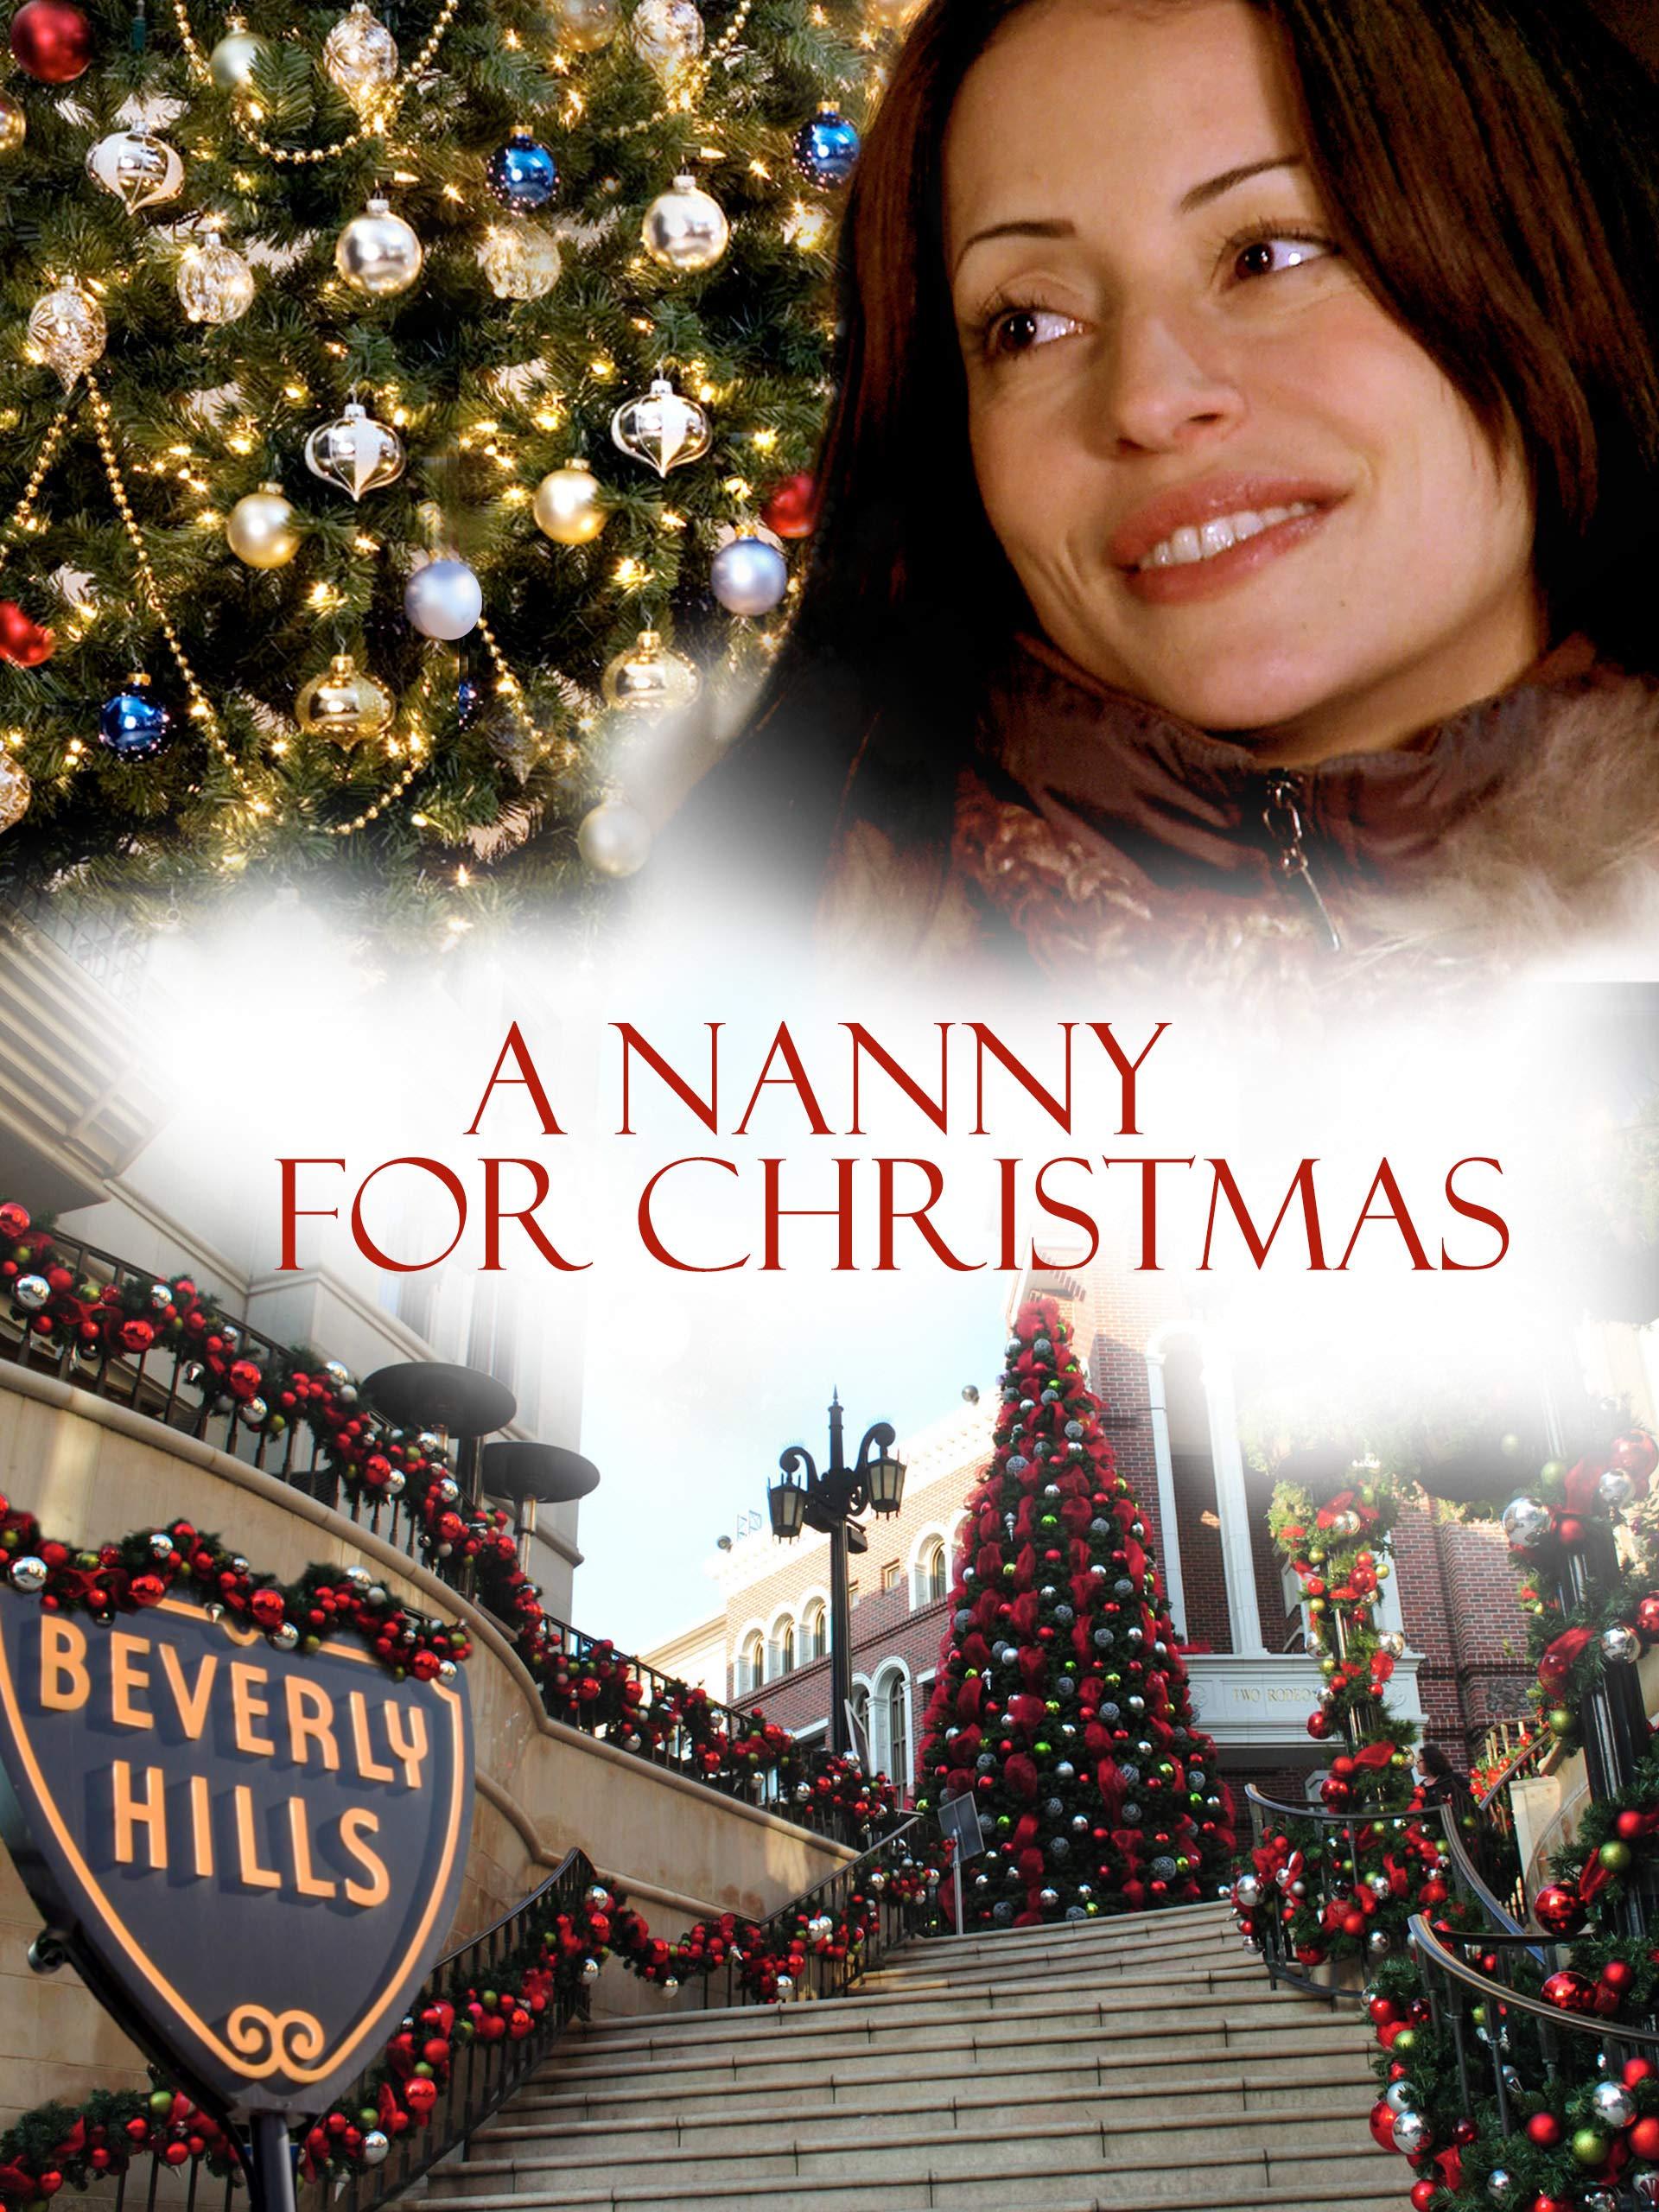 A Nanny For Christmas.Amazon Com A Nanny For Christmas Michael Feifer